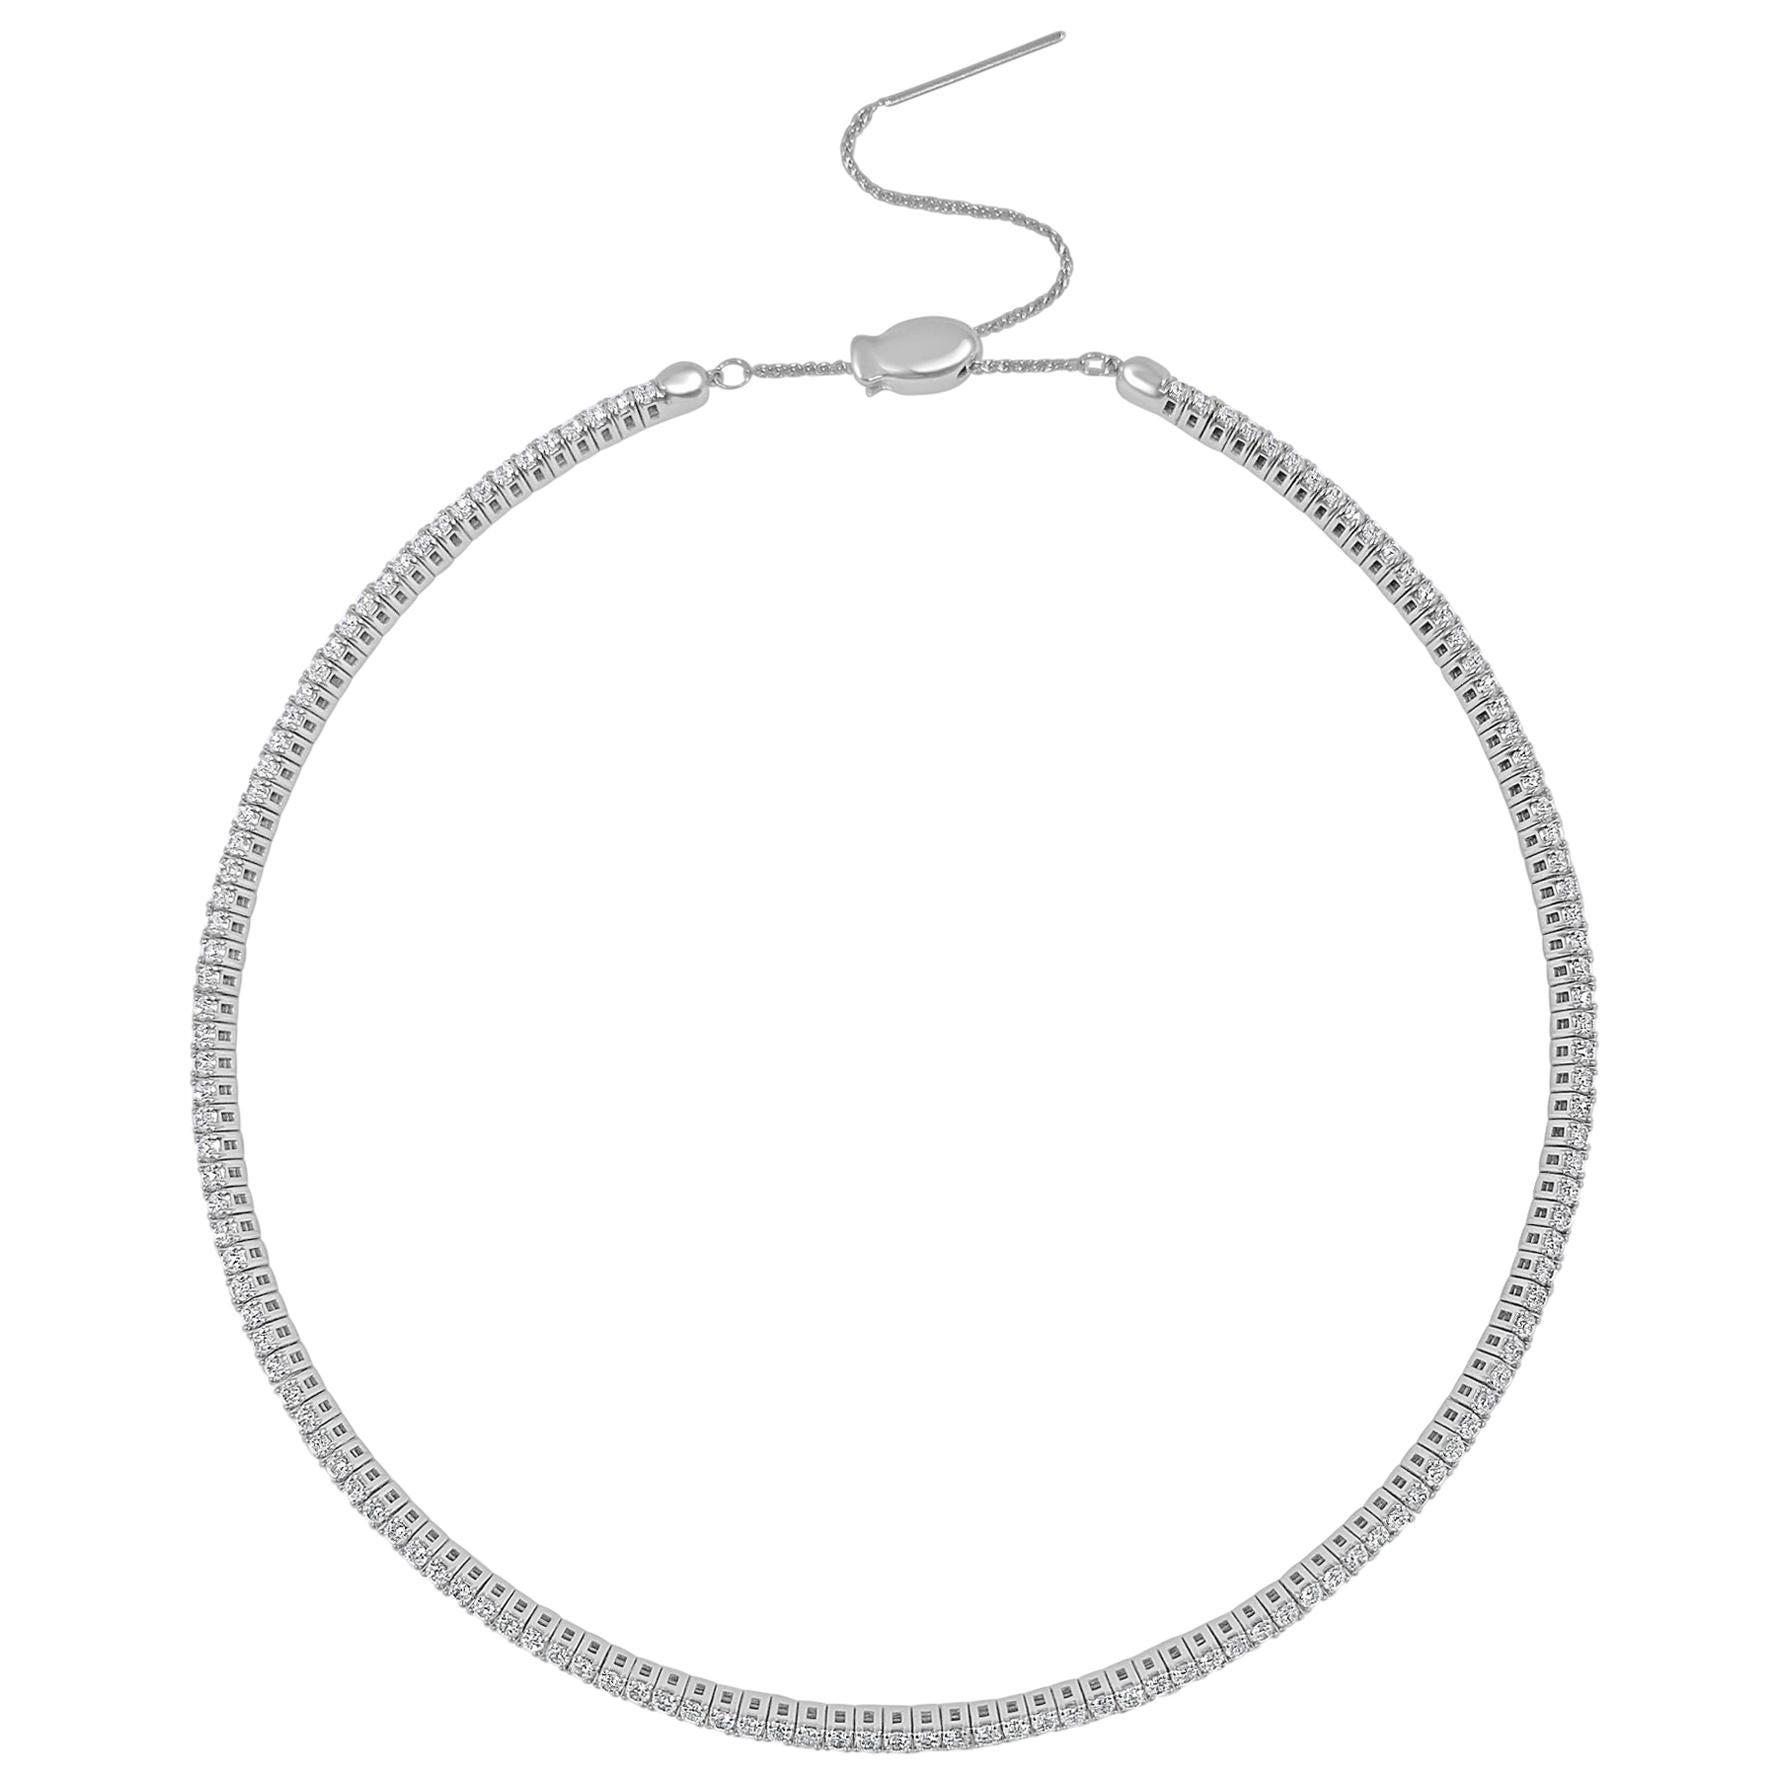 14 Karat White Gold 3.56 Carat Diamond Choker Collar Necklace